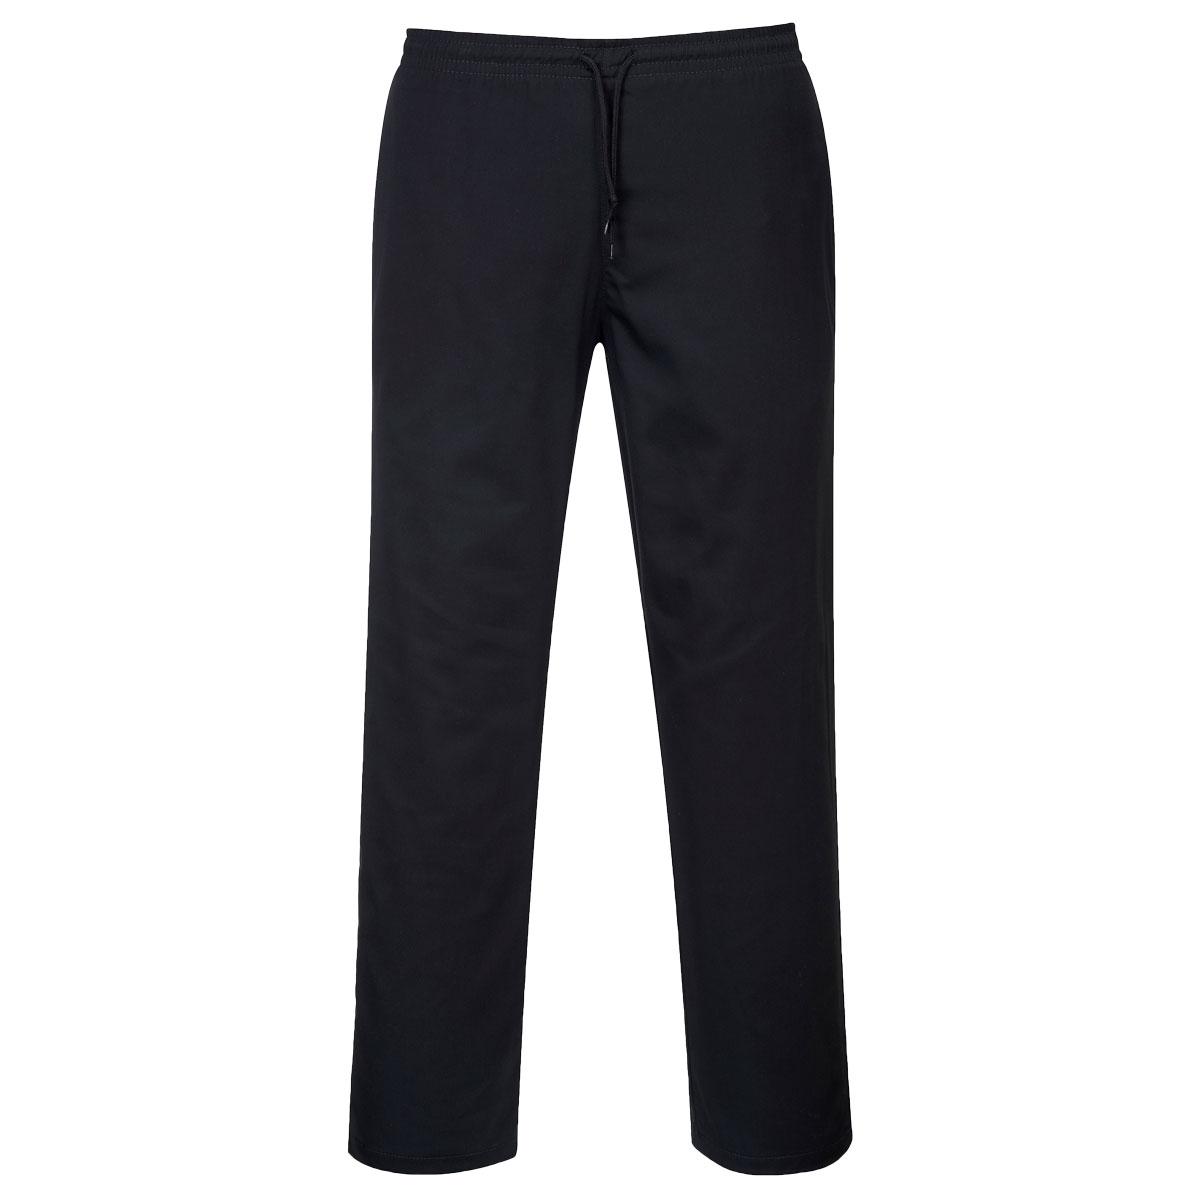 Drawstring Trousers - C070